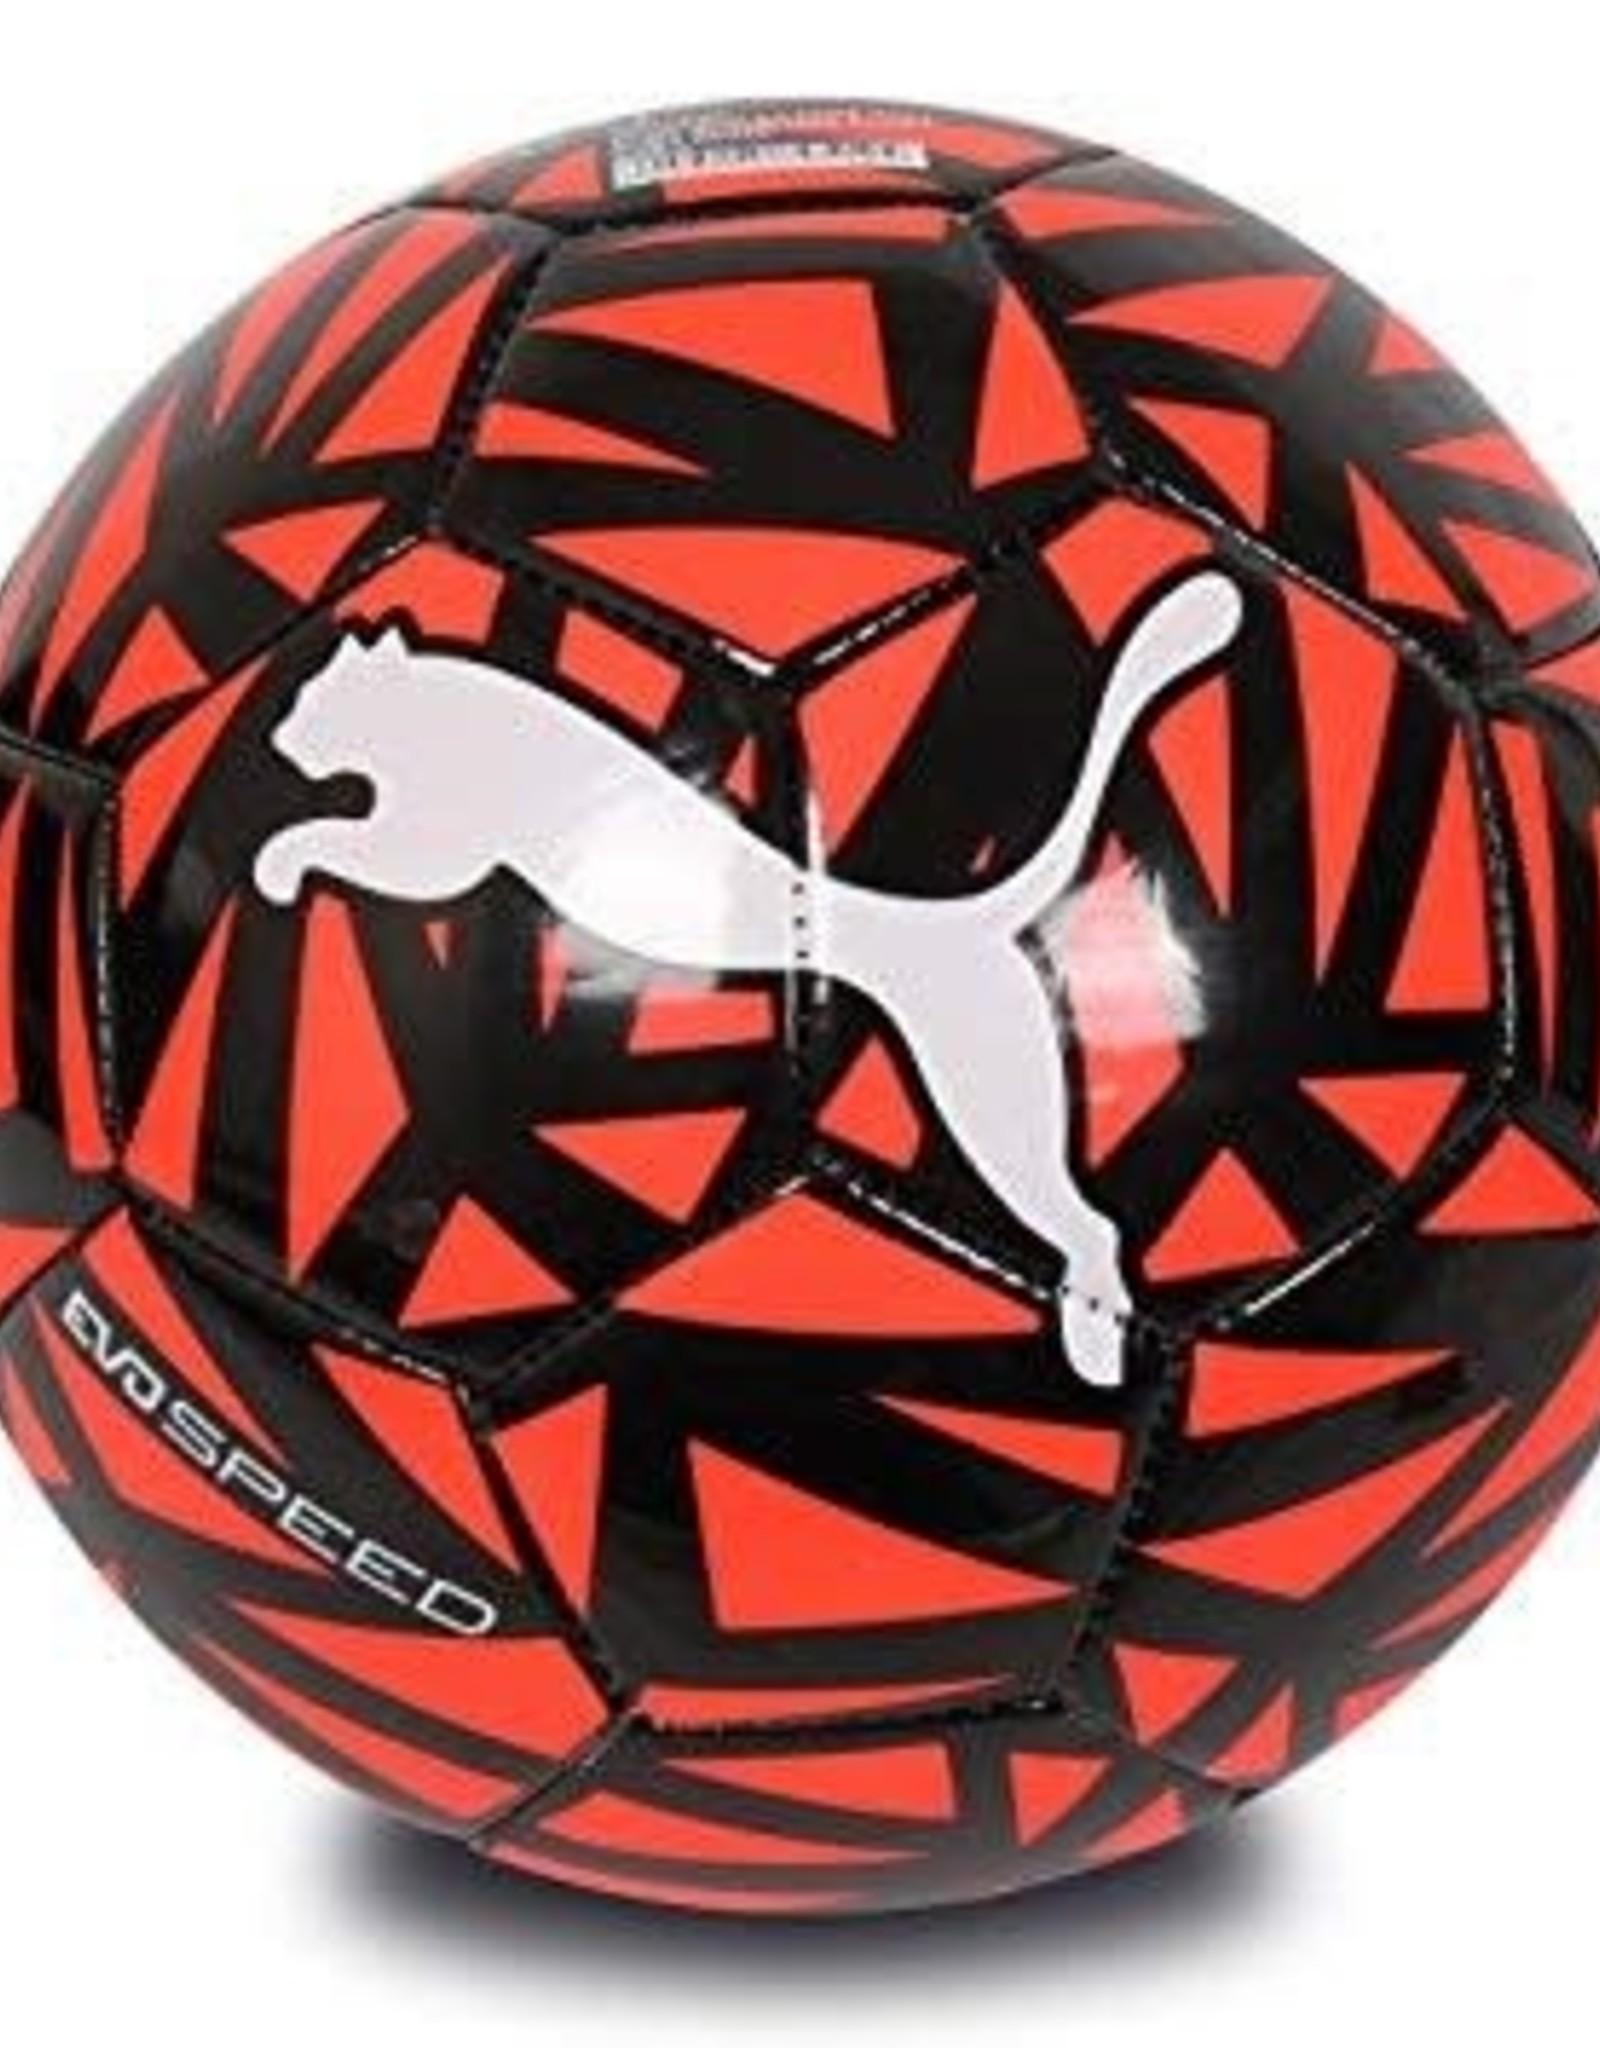 Puma Puma EvoSpeed 5.5 Soccer Ball Size 5